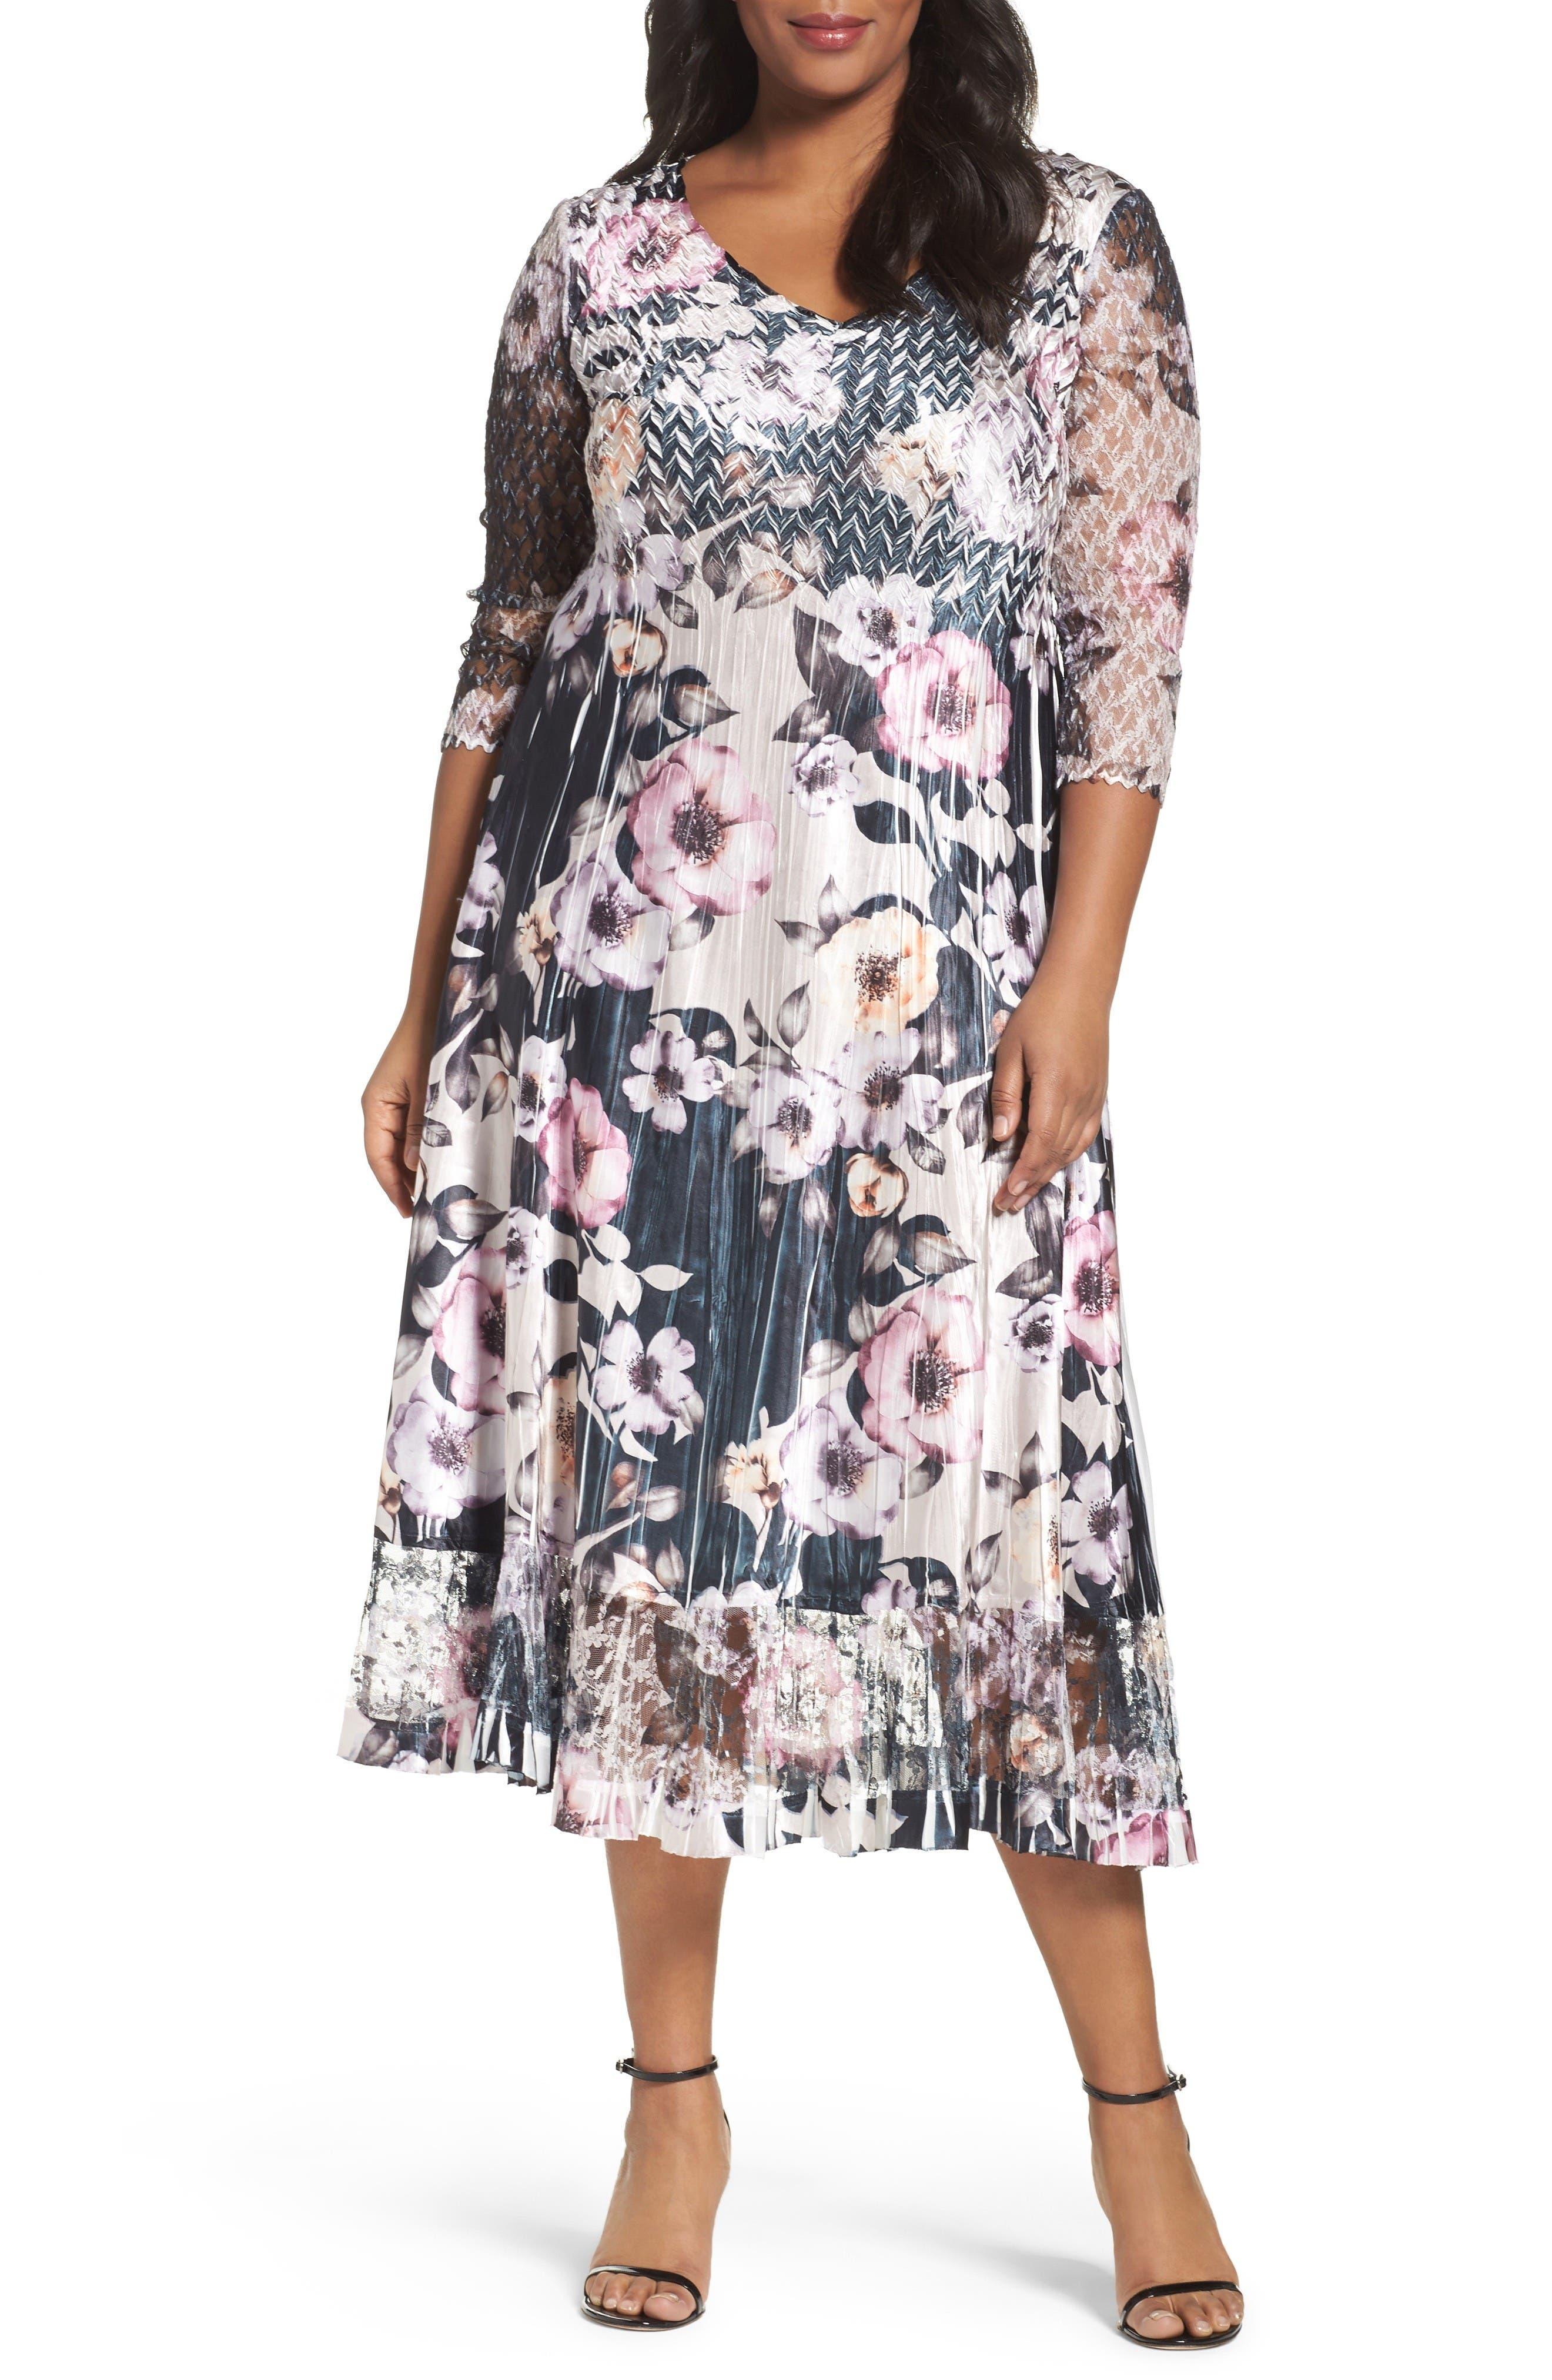 Alternate Image 1 Selected - Komarov Print Lace & Charmeuse Dress (Plus Size)